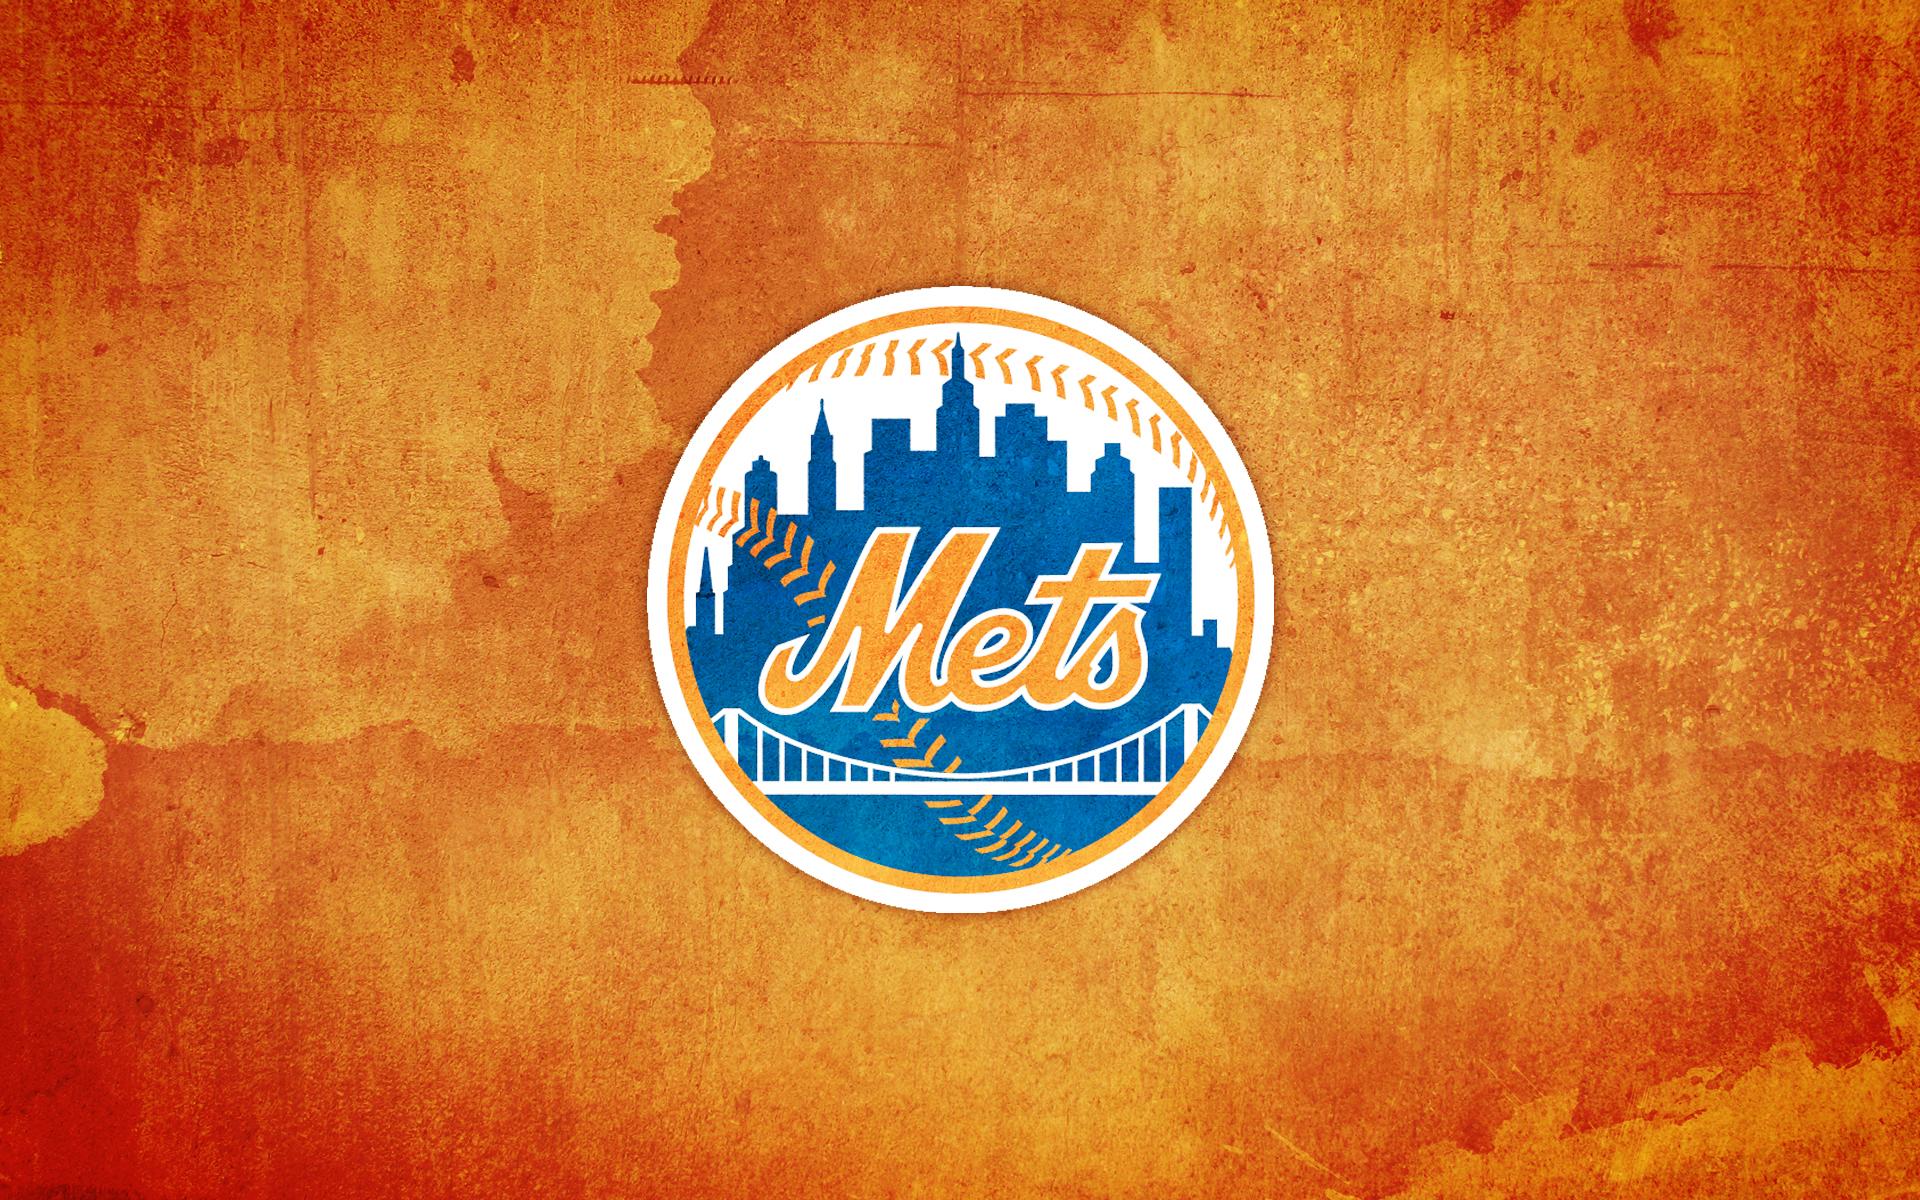 New York Mets wallpapers New York Mets background 1920x1200